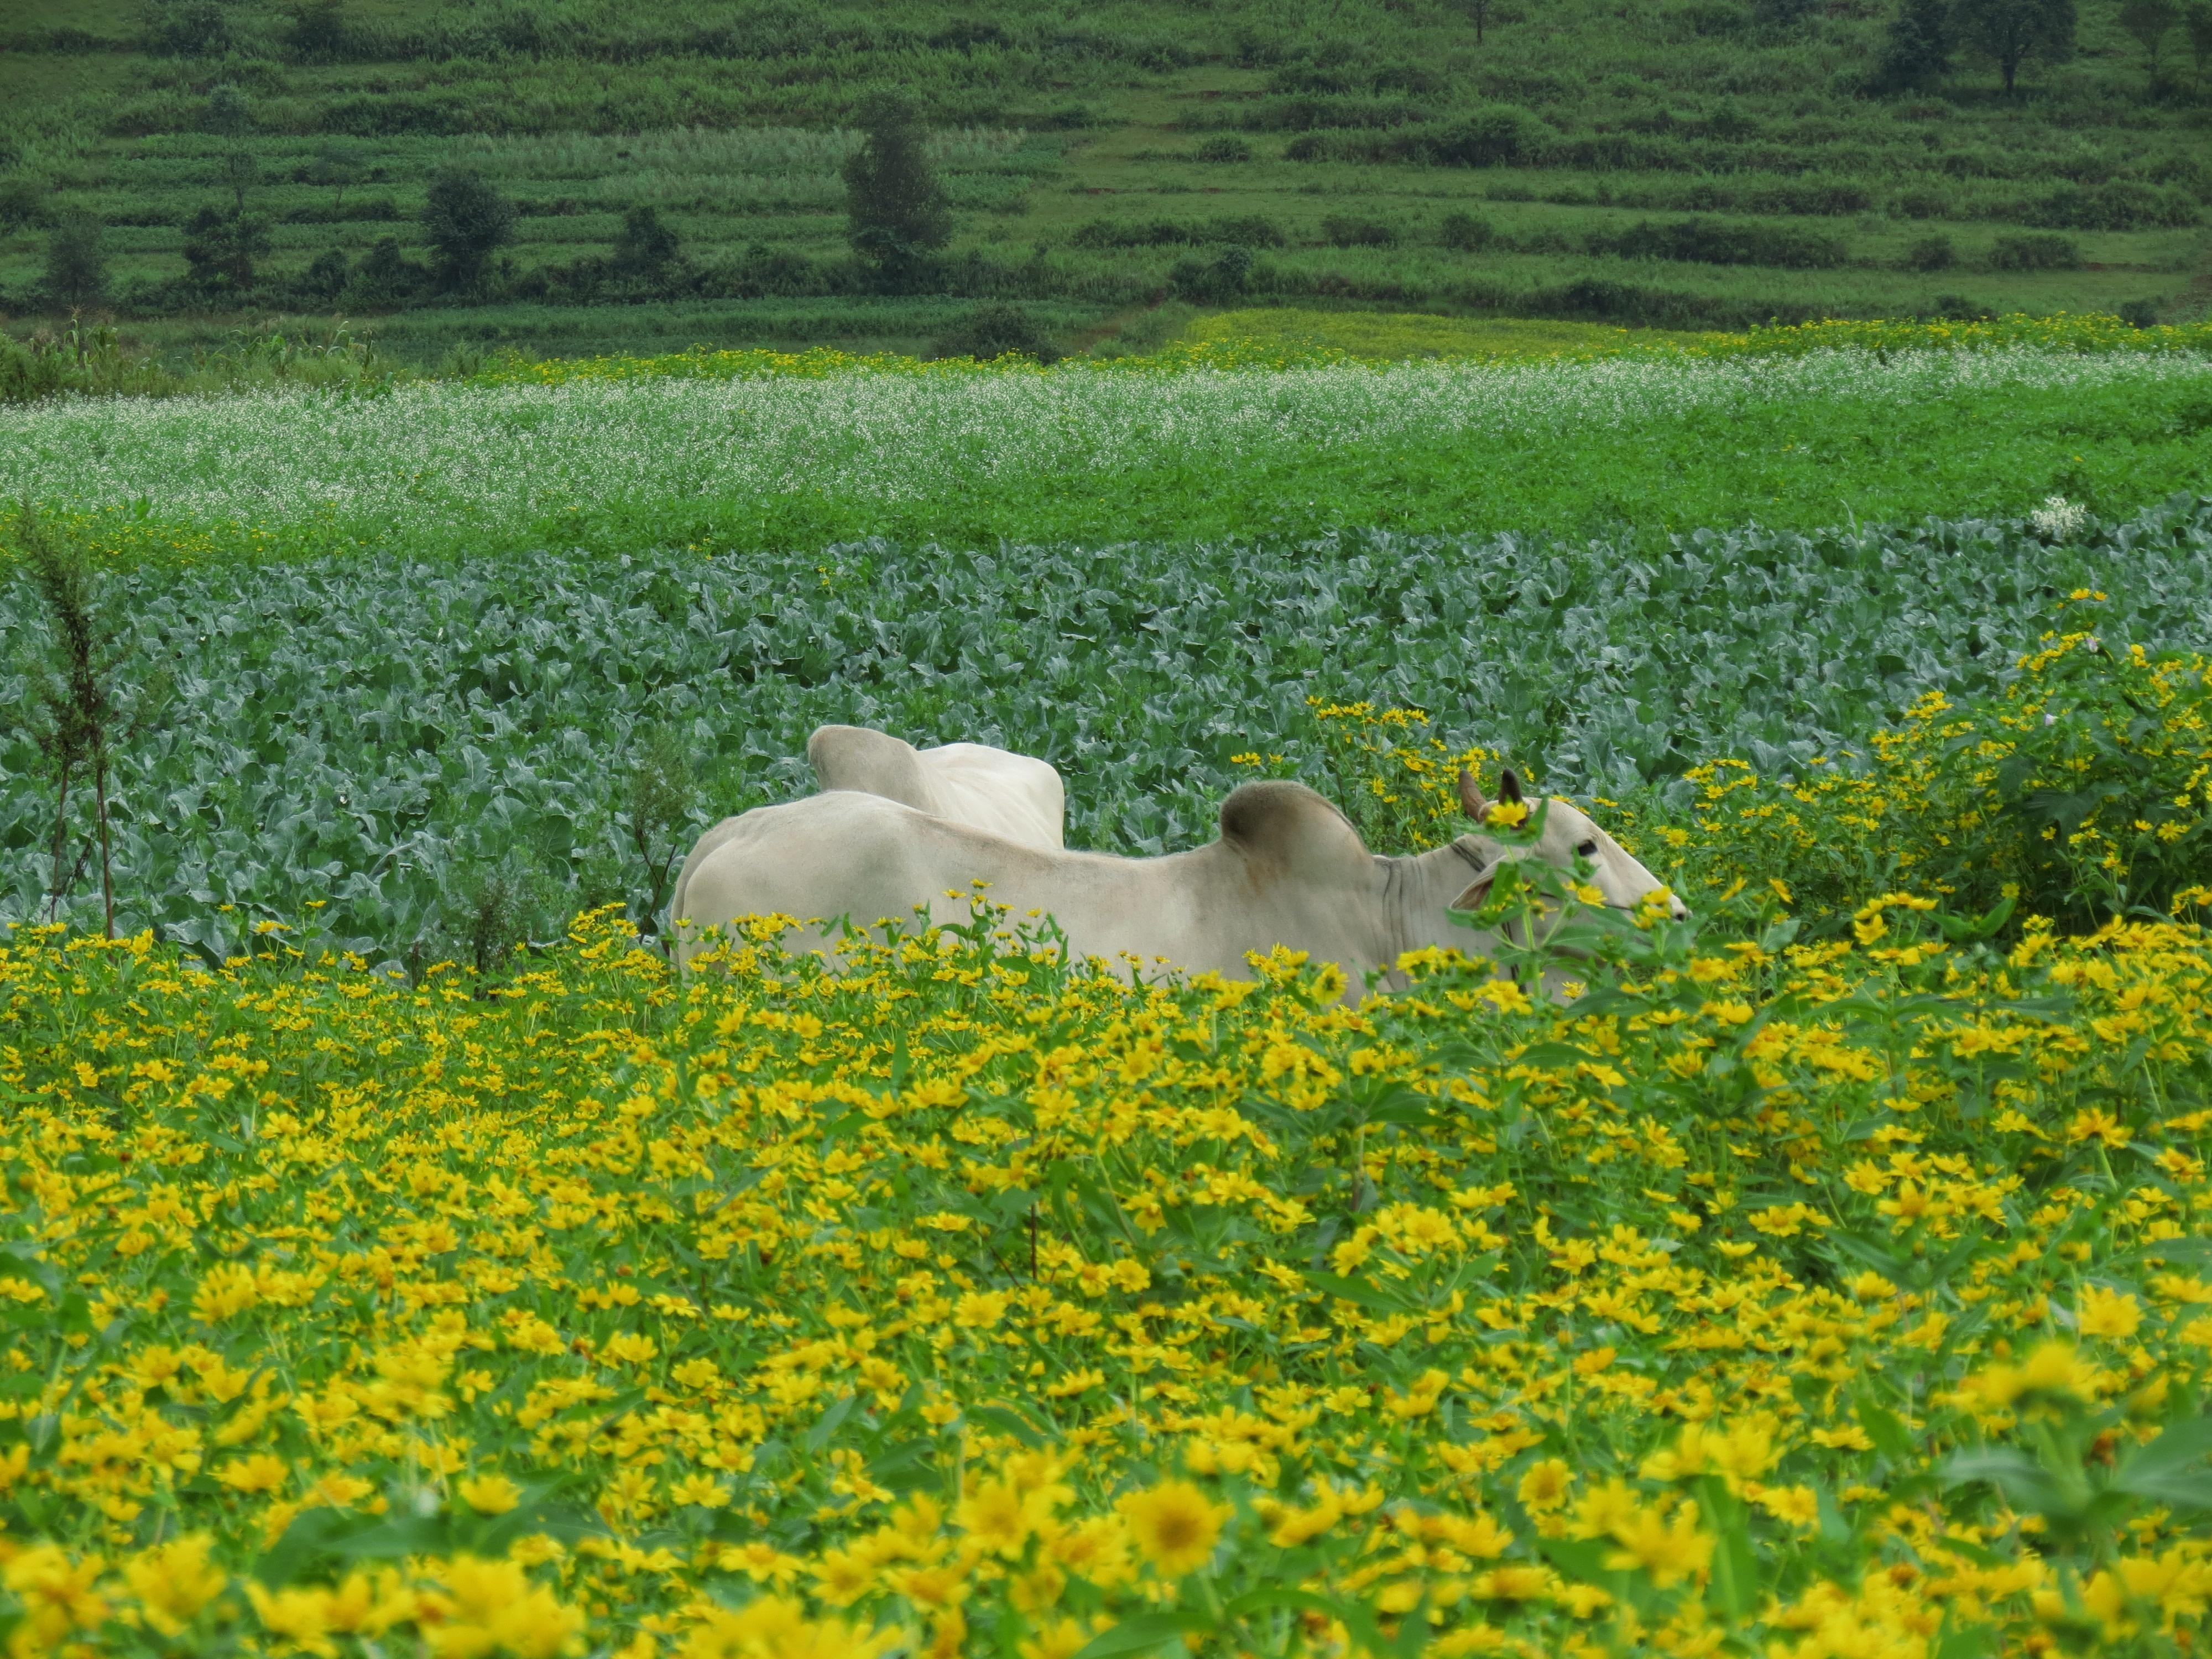 Cow roaming amidst greenery